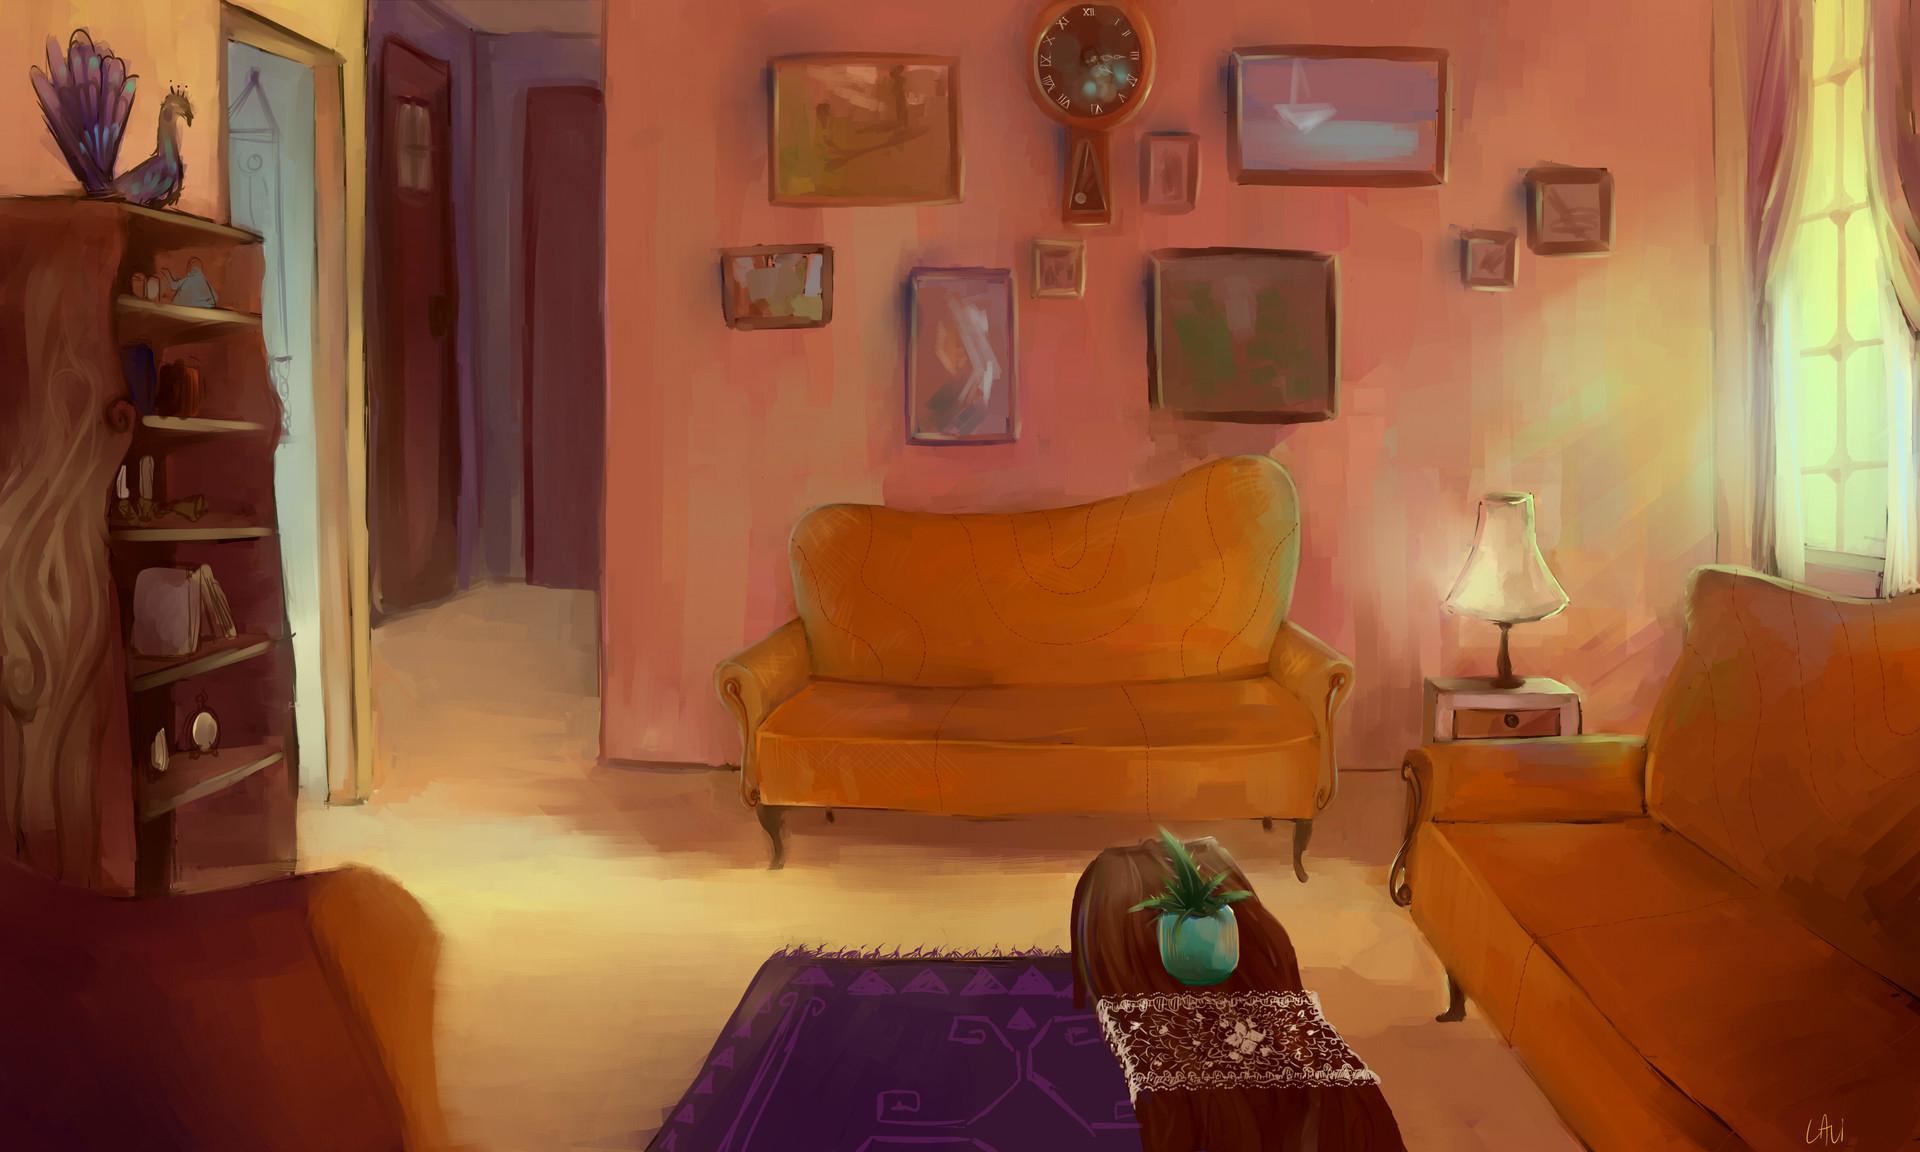 Meitar lavi living room scene polish